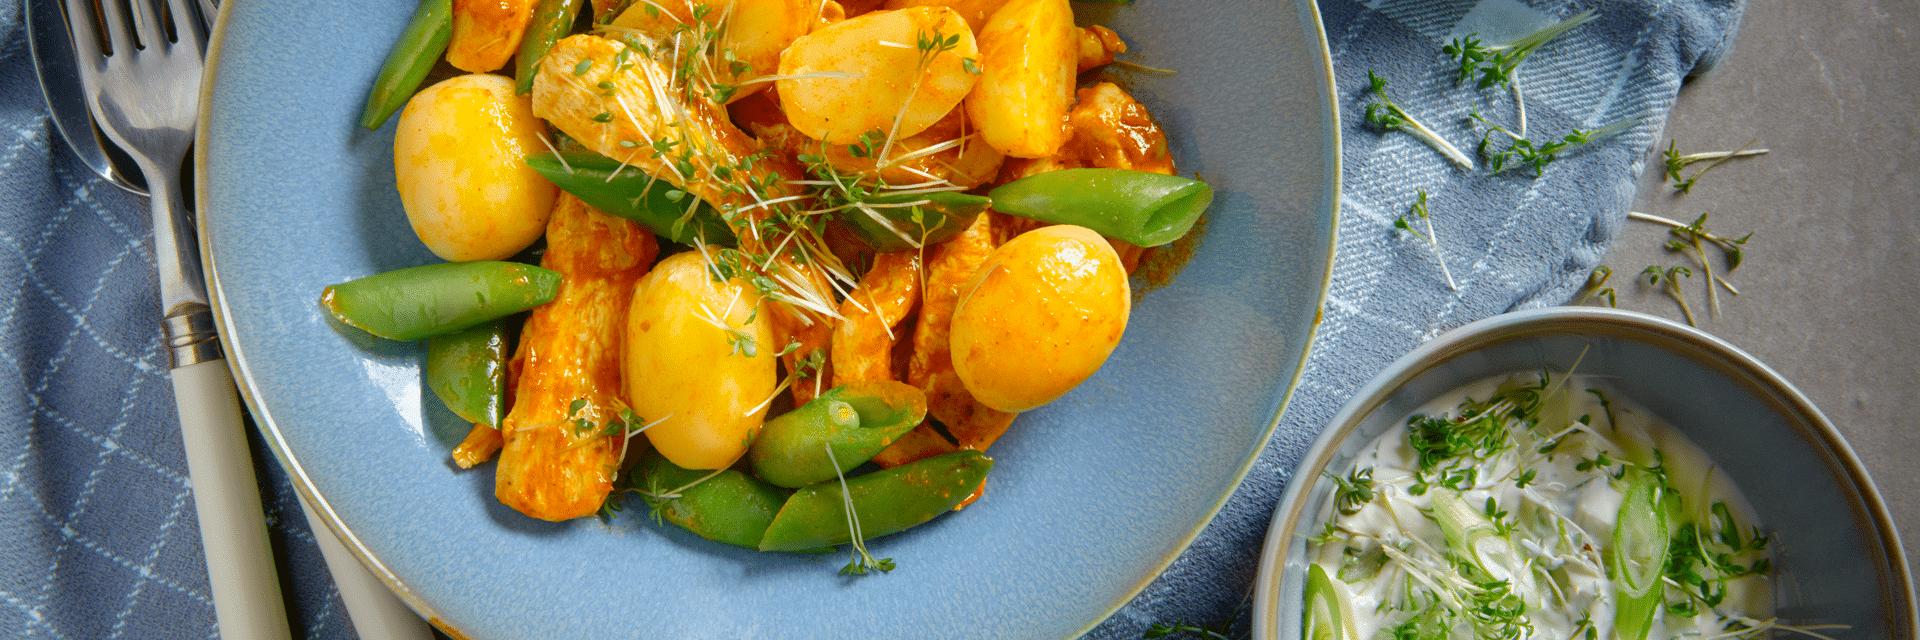 Tikka Masala aardappel kip salade